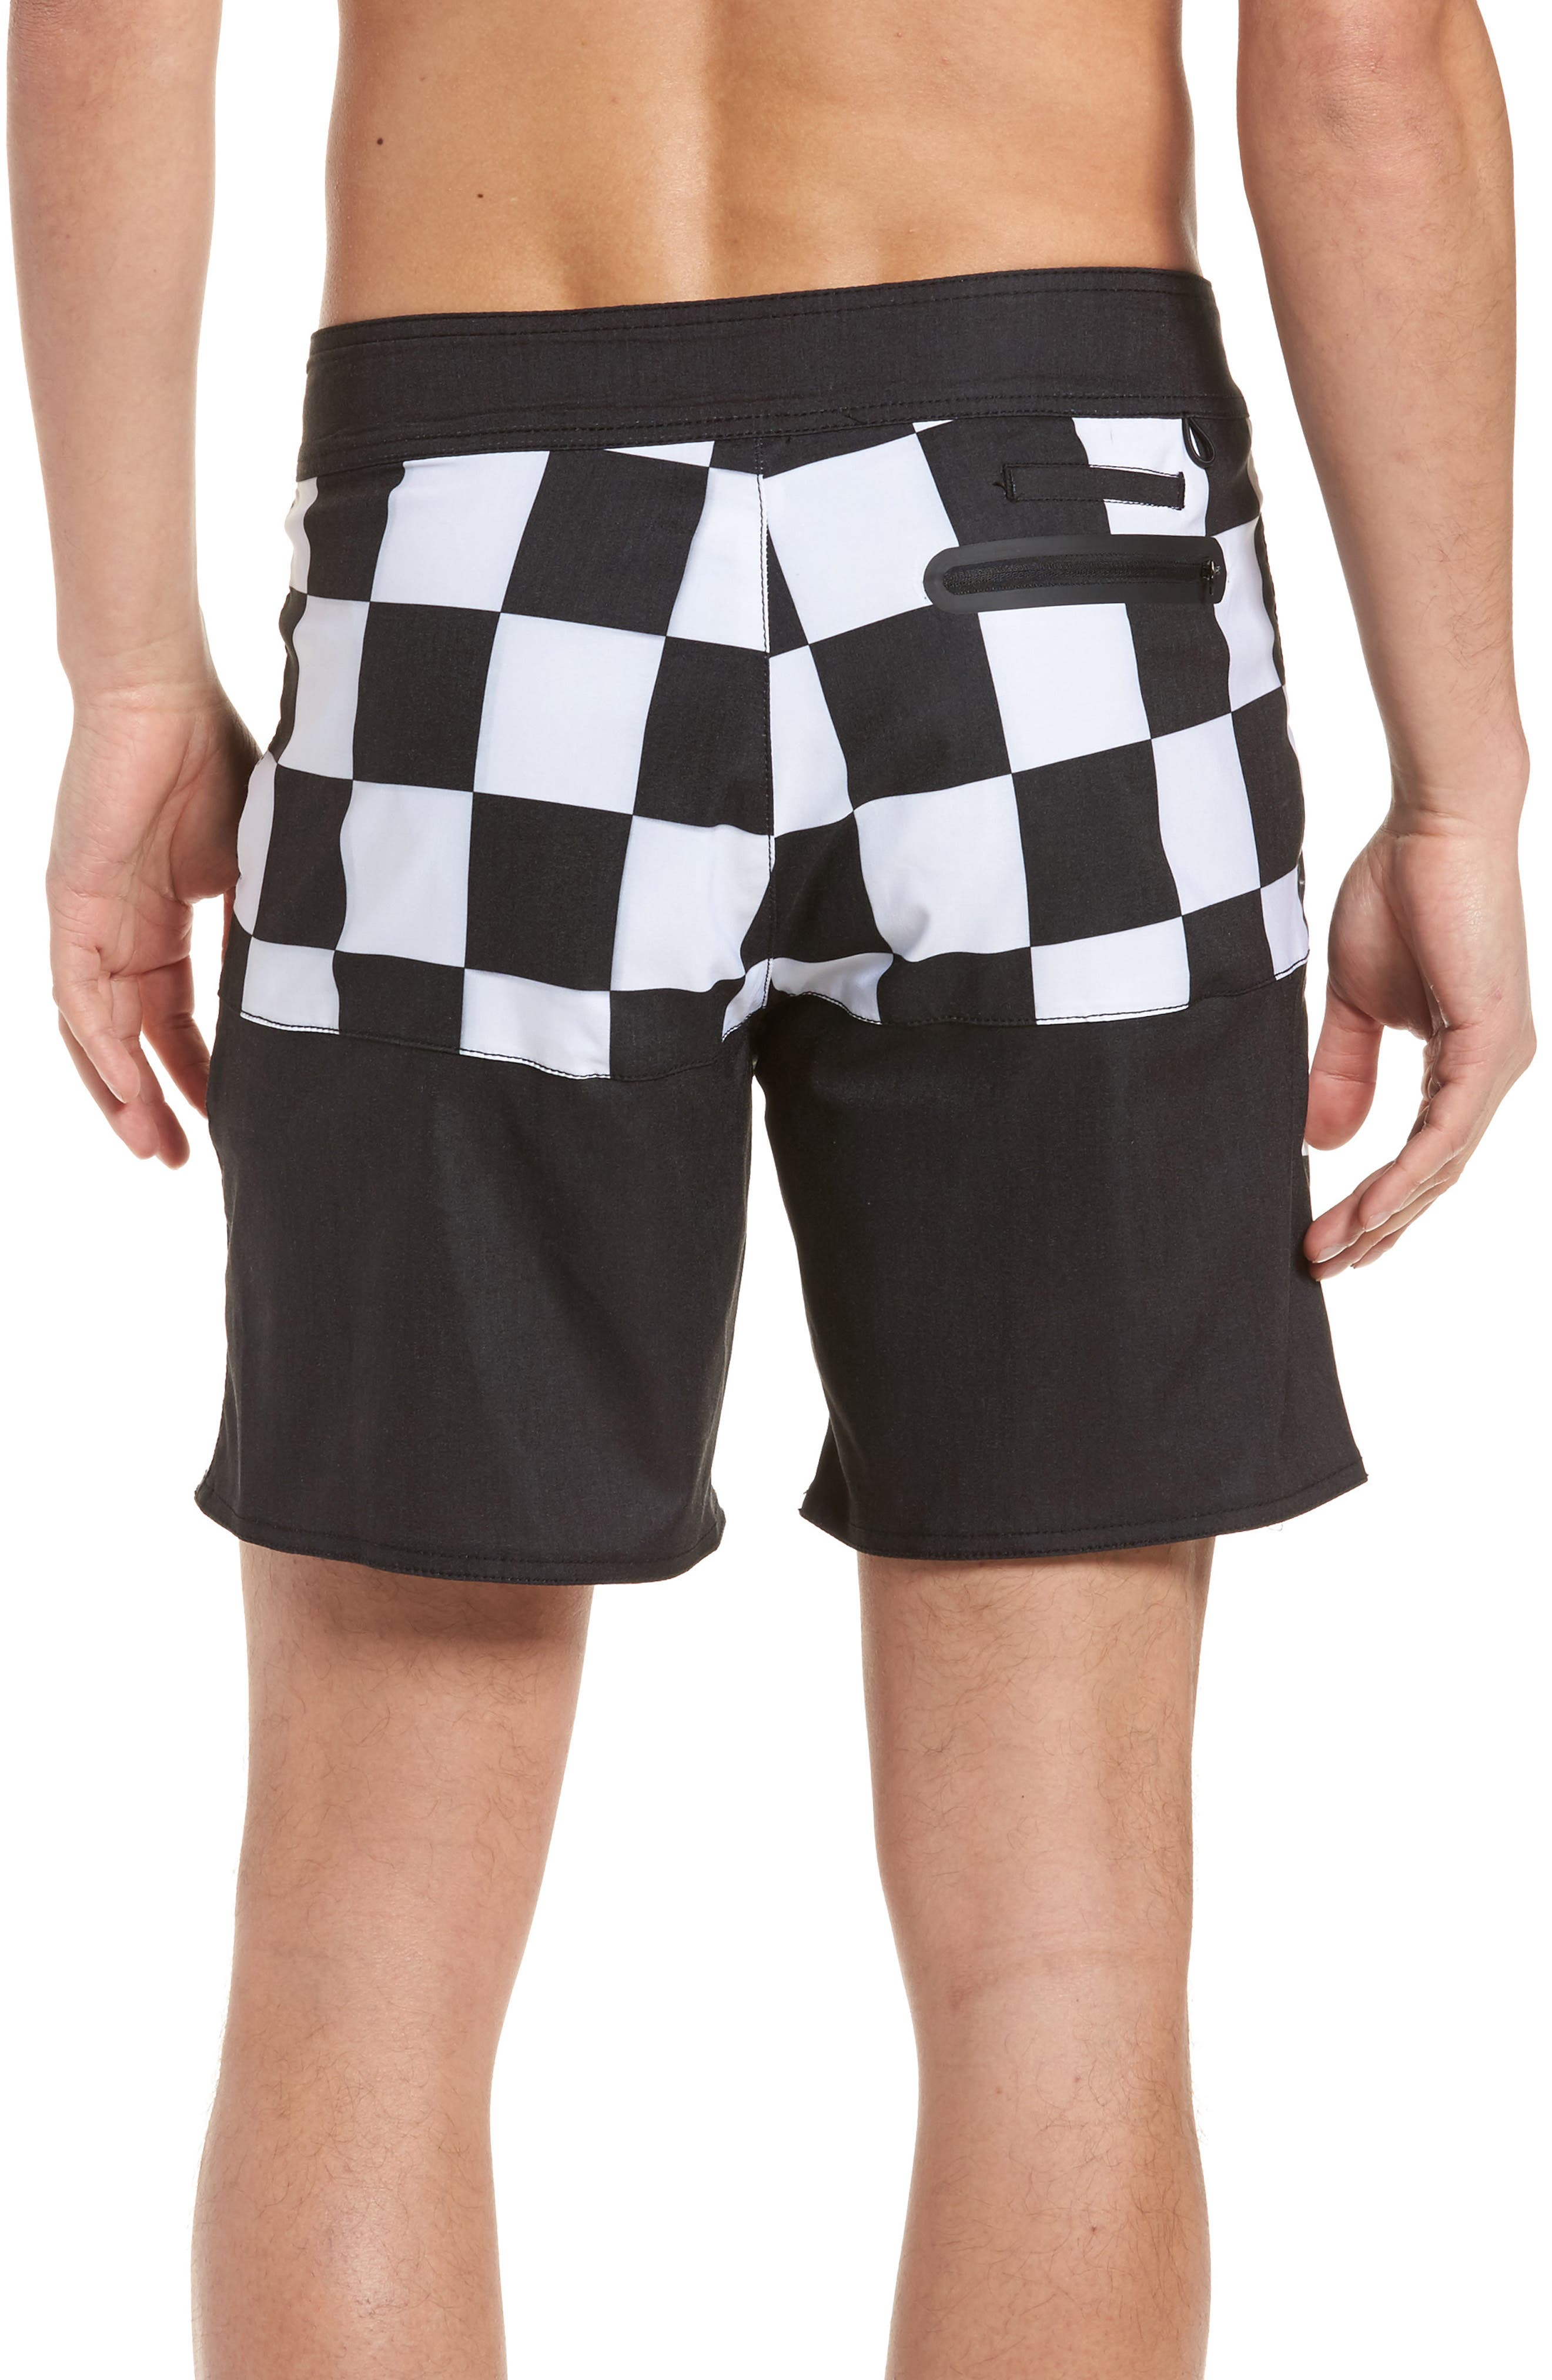 Checkered Board Shorts,                             Alternate thumbnail 2, color,                             001